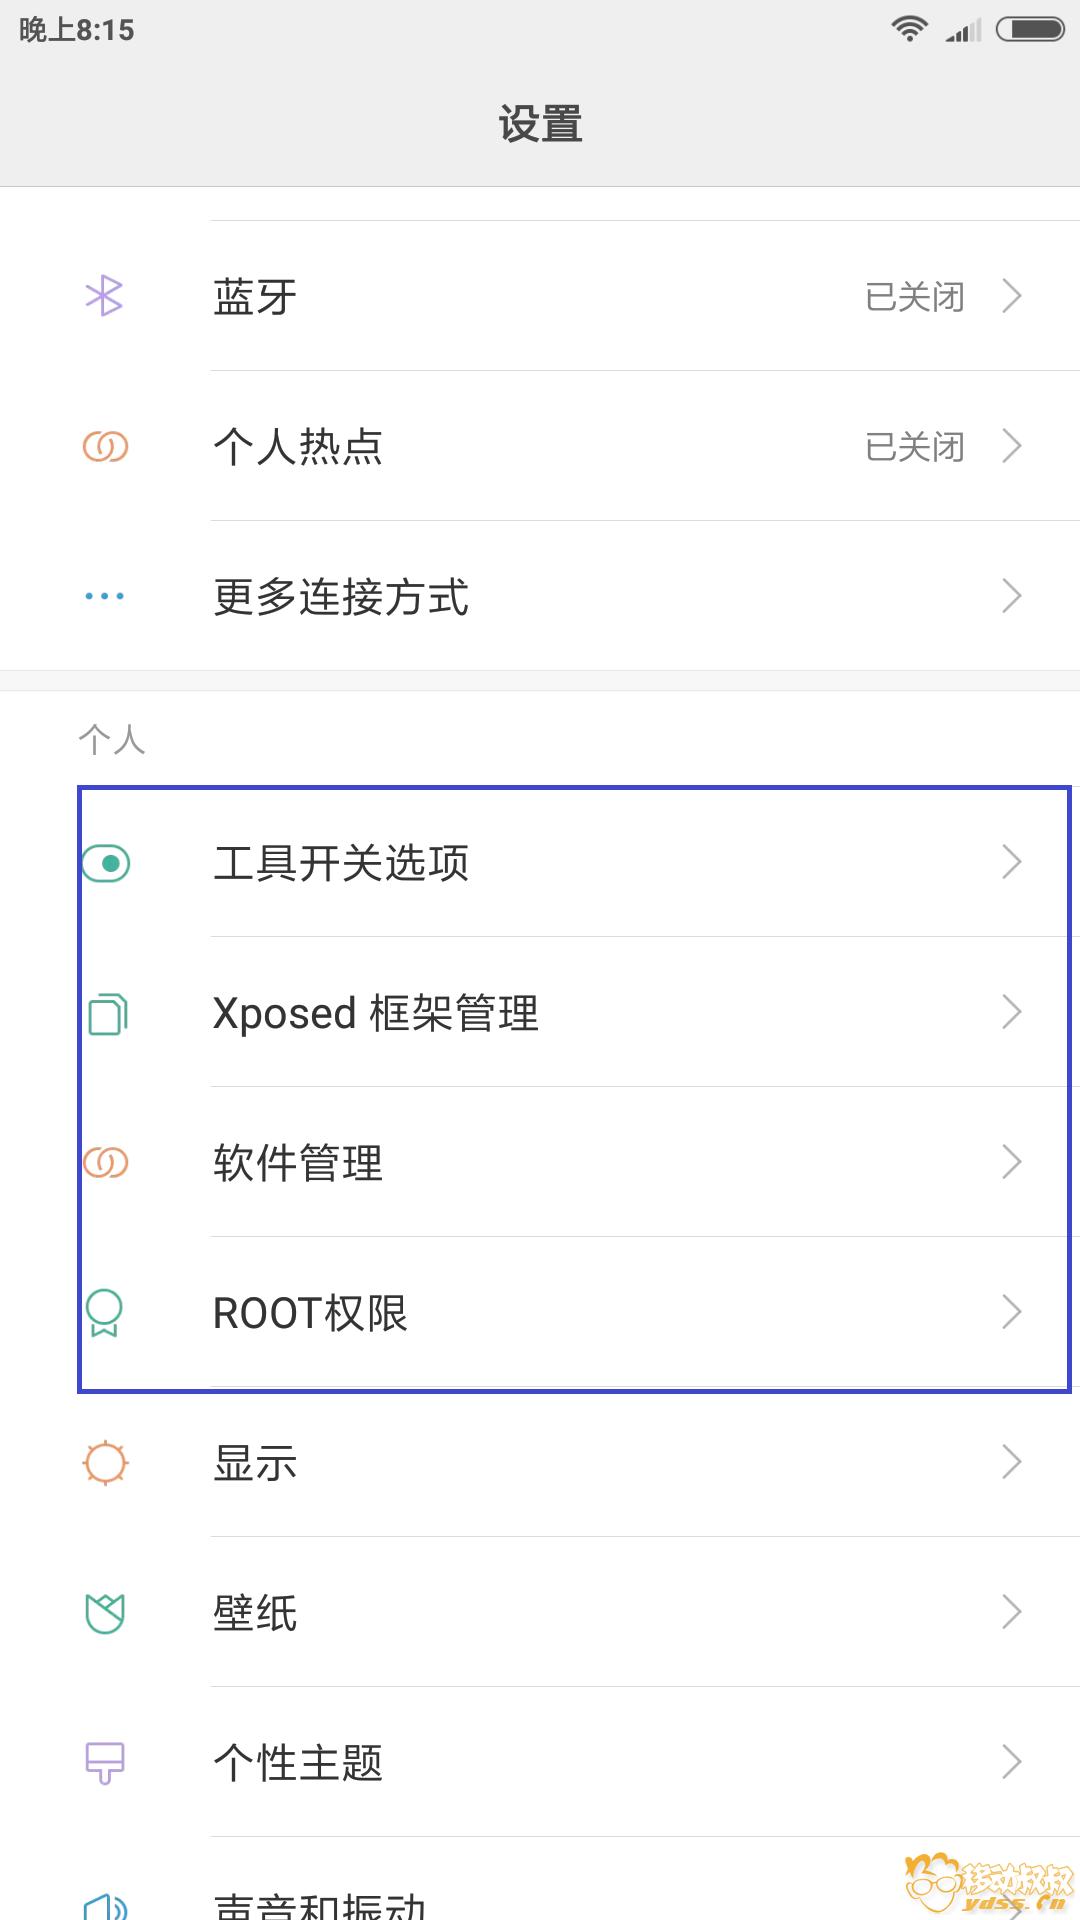 Screenshot_2018-02-28-20-15-49-287_com.android.settings.png